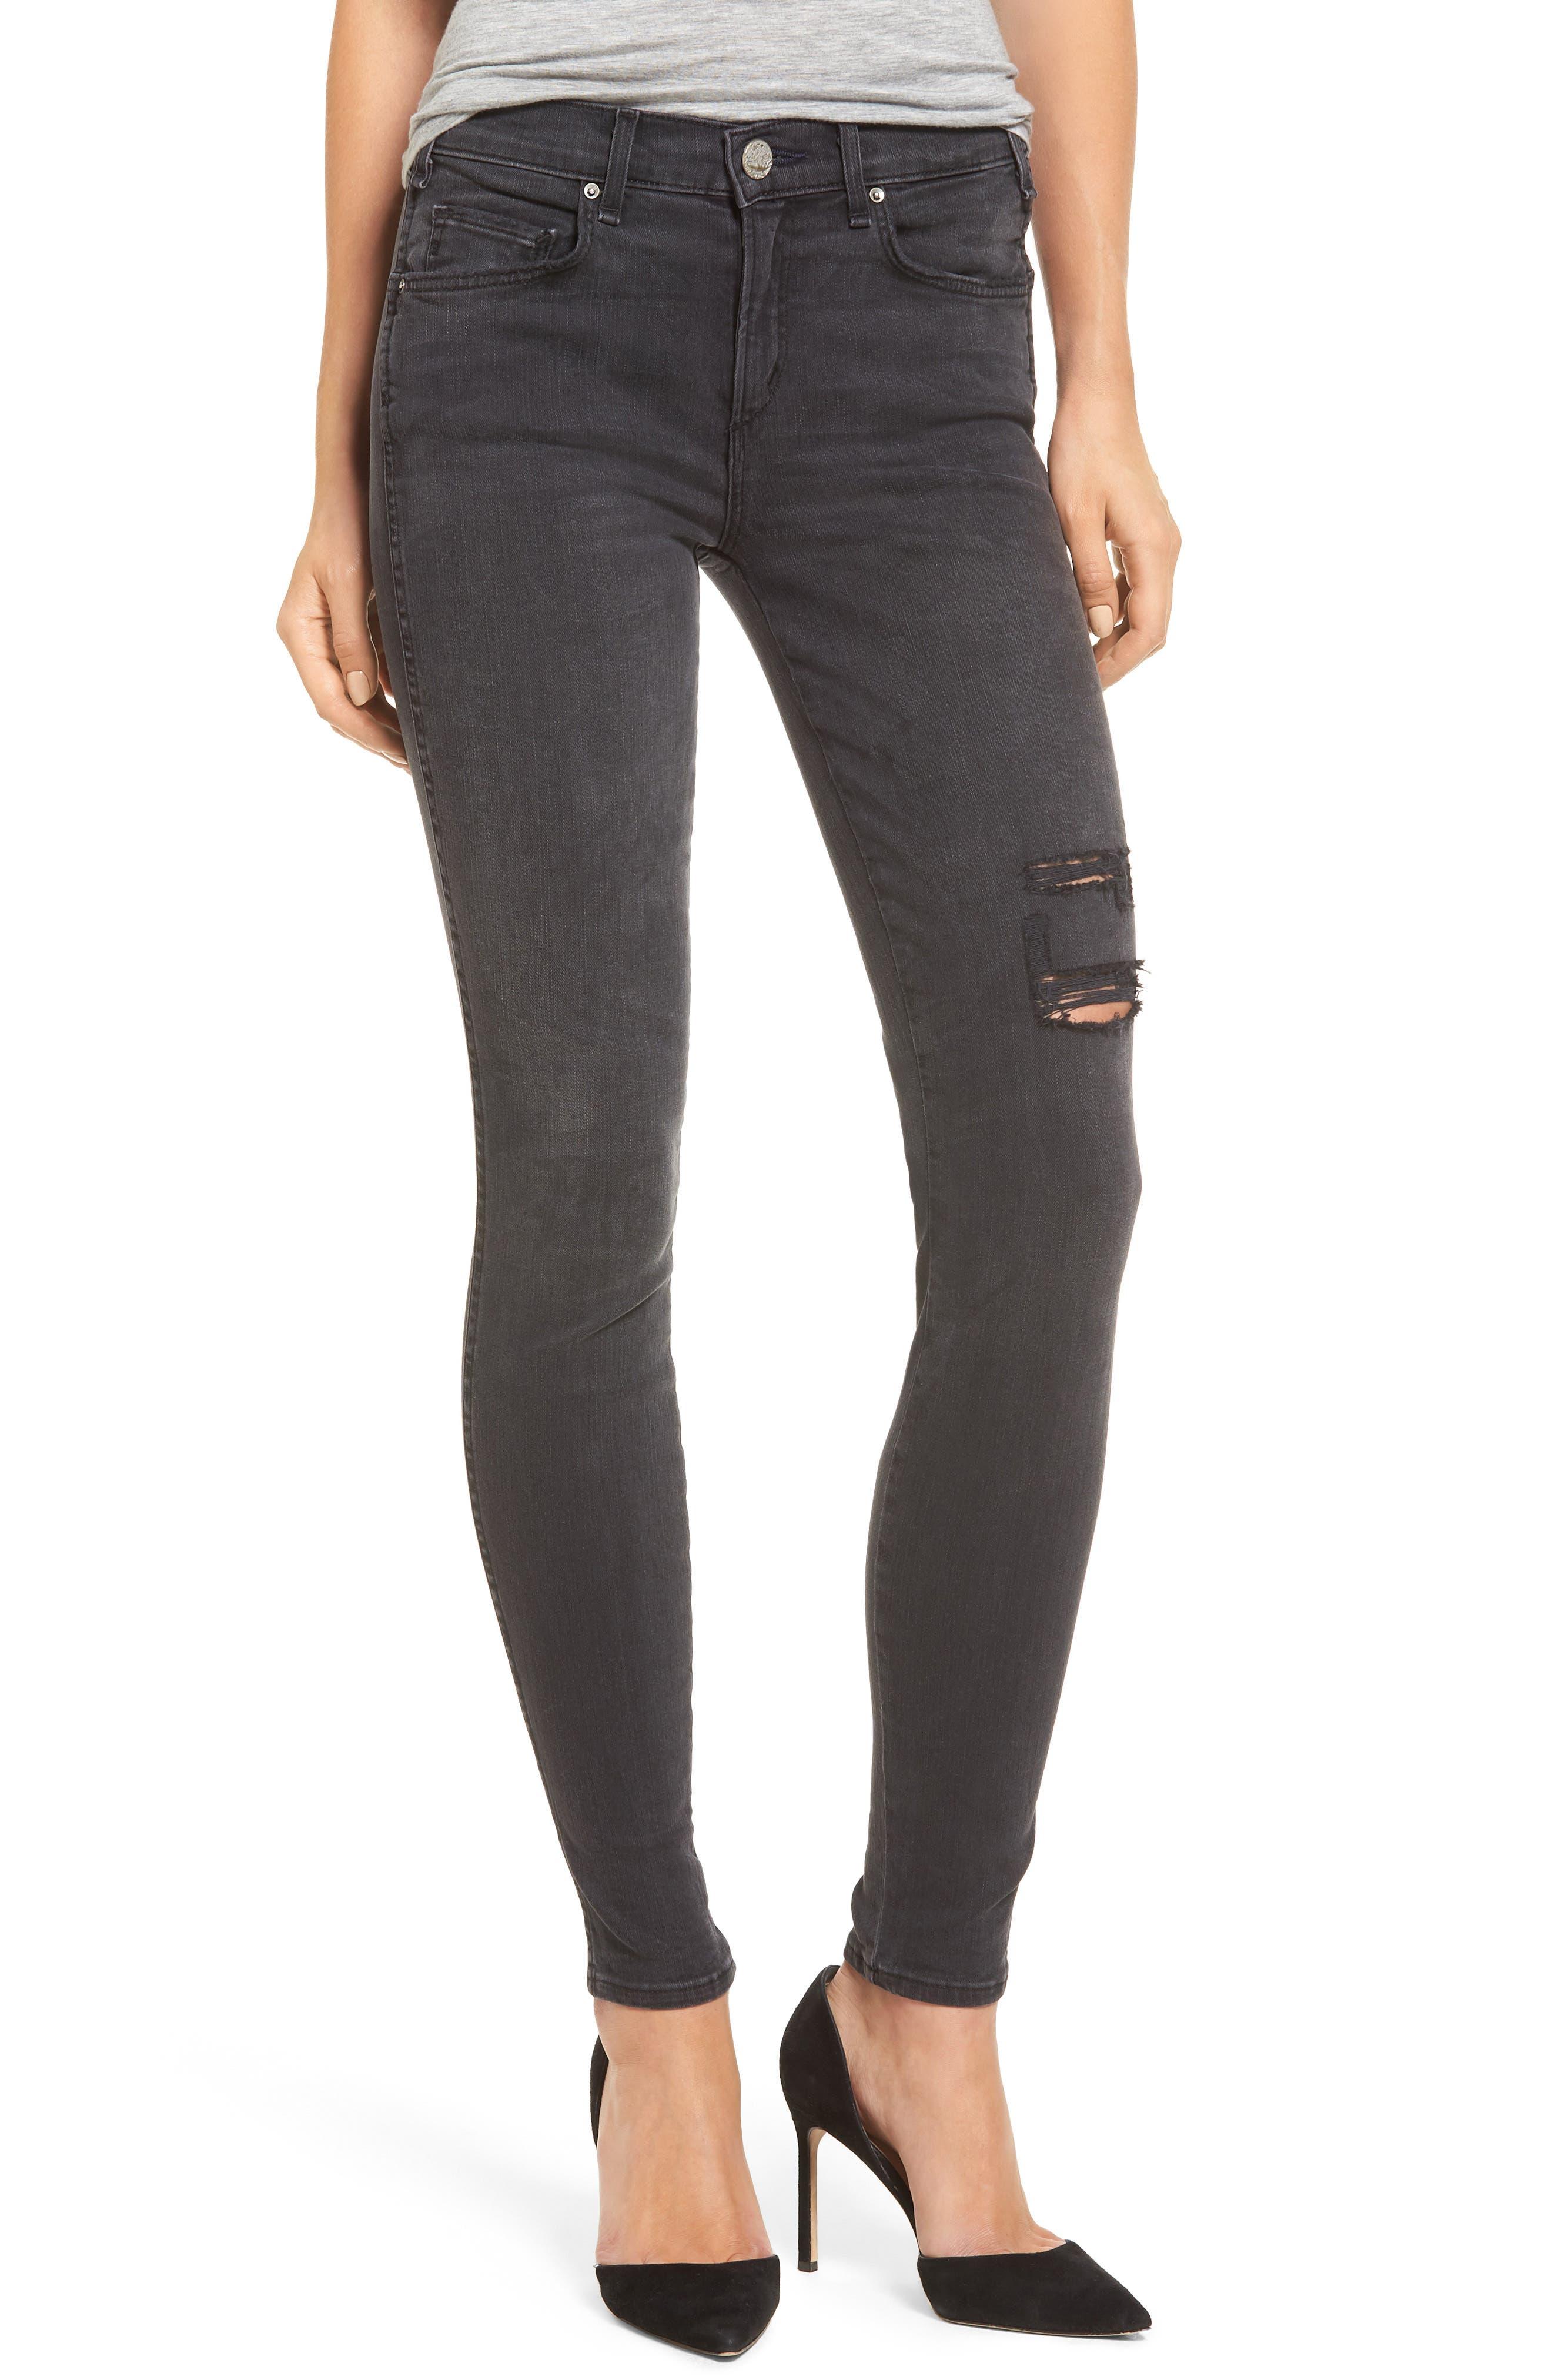 Main Image - McGuire Newton Skinny Jeans (Las Pozas)